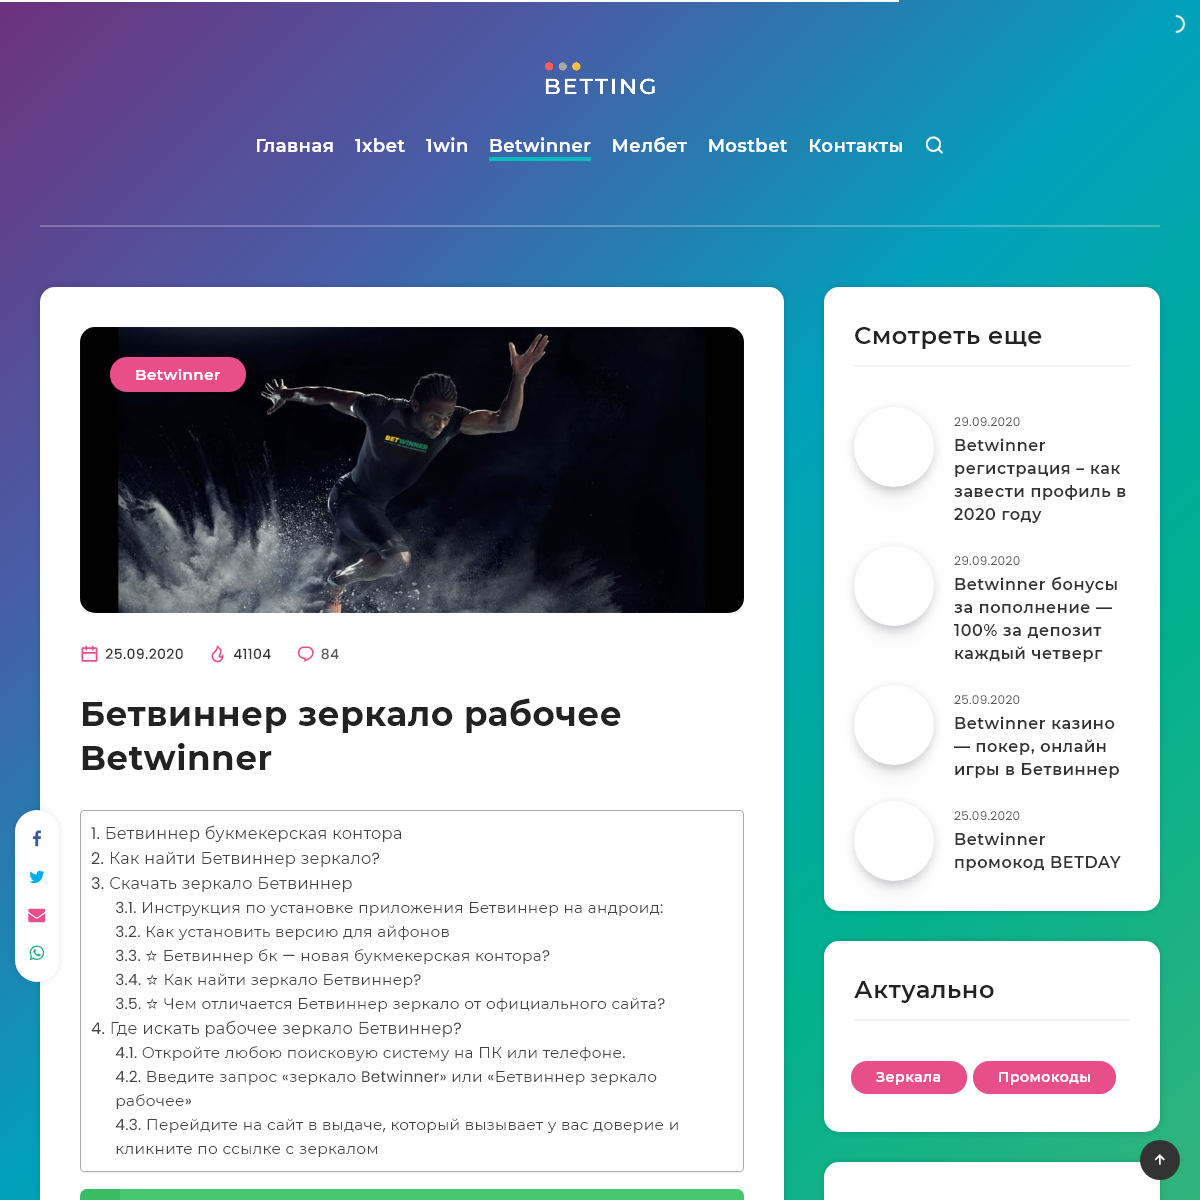 Бетвиннер зеркало рабочее Betwinner официальный сайт 2020